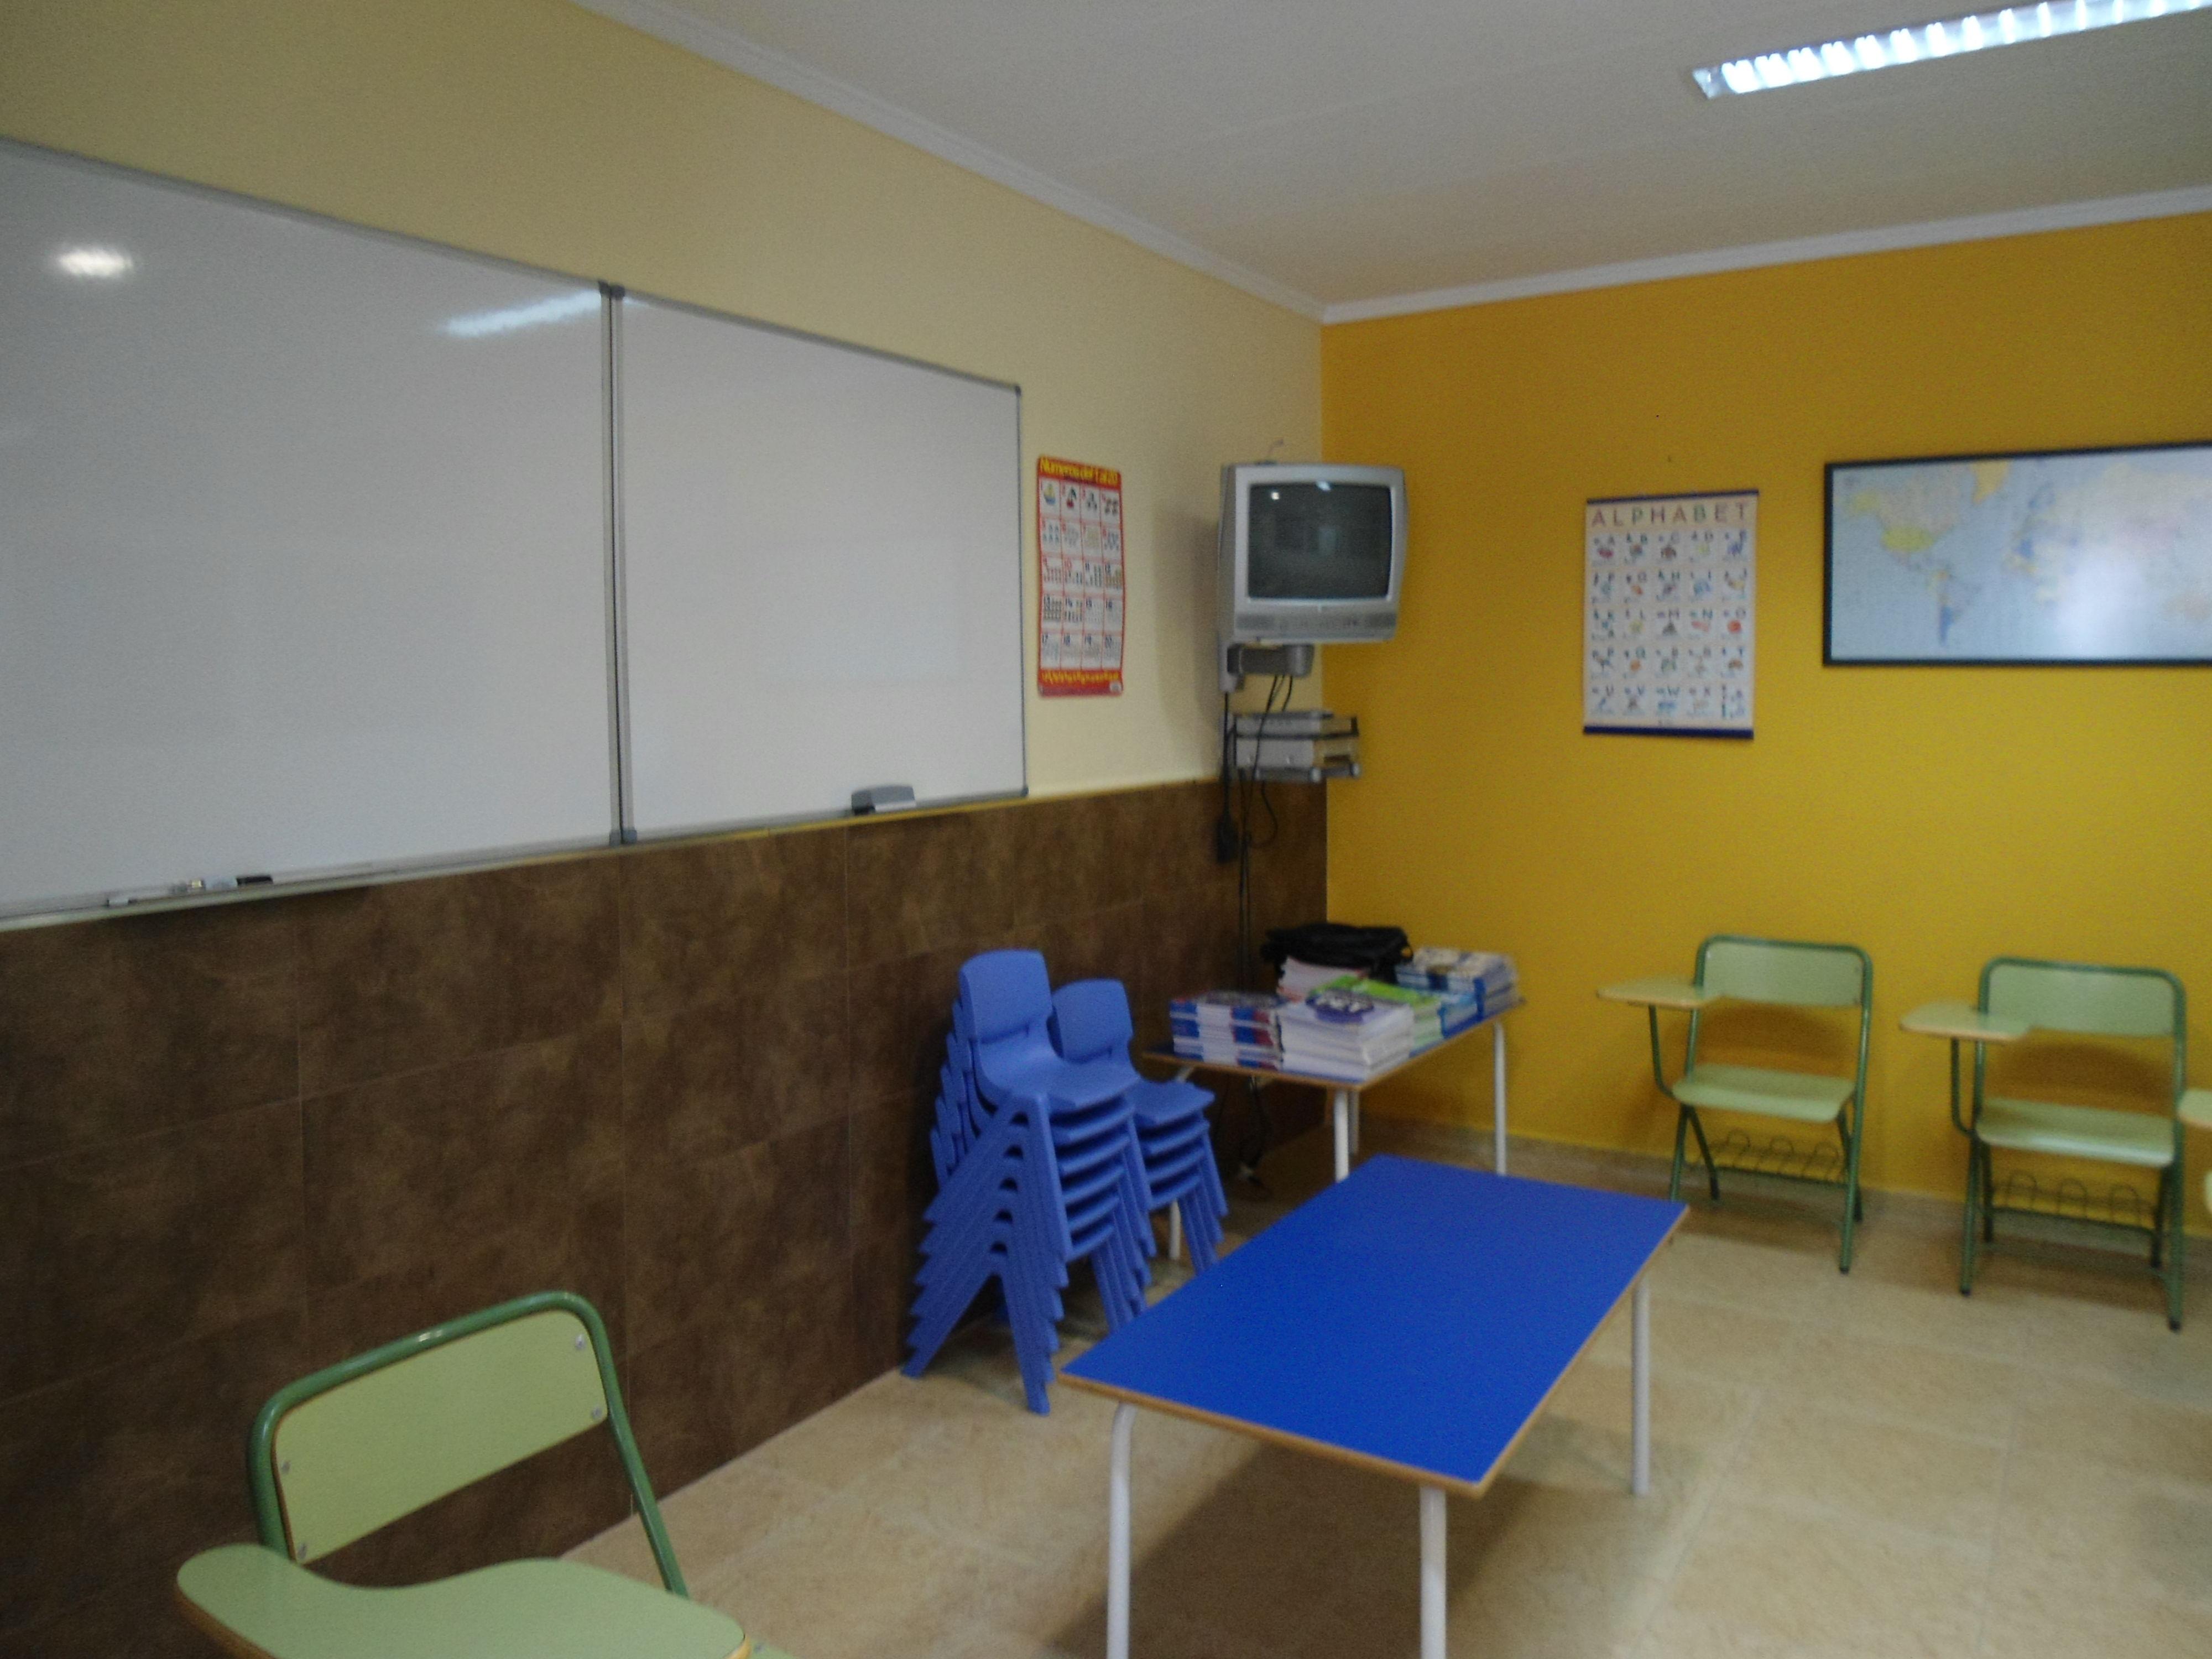 Foto 21 de Academias de idiomas en Moncada | Centre d'Estudis Etnies